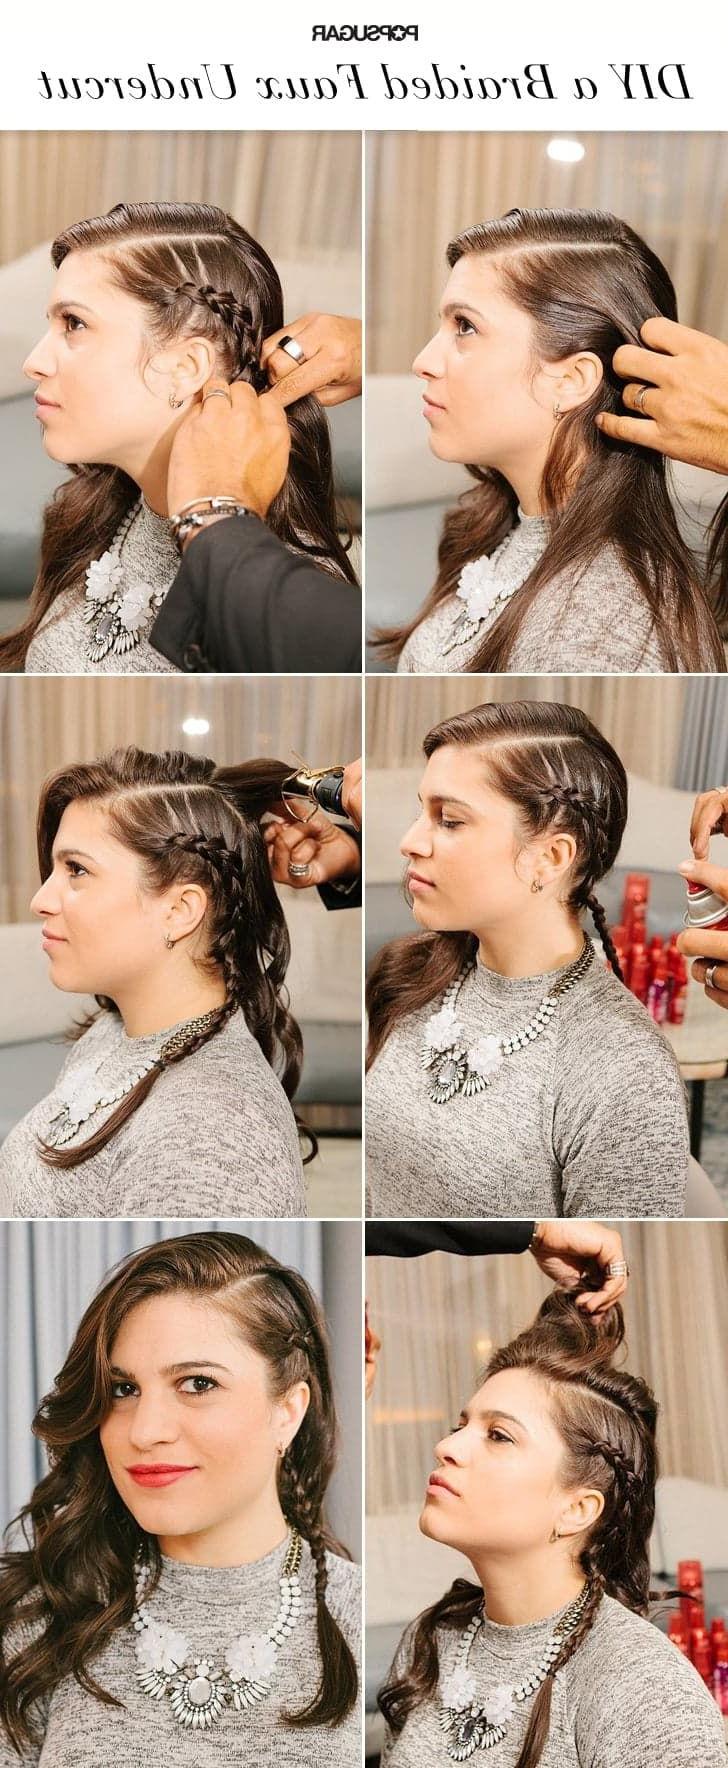 2019 Faux Undercut Braid Hairstyles Throughout Diy A Kristen Stewart Inspired Faux Braided Undercut (View 3 of 20)